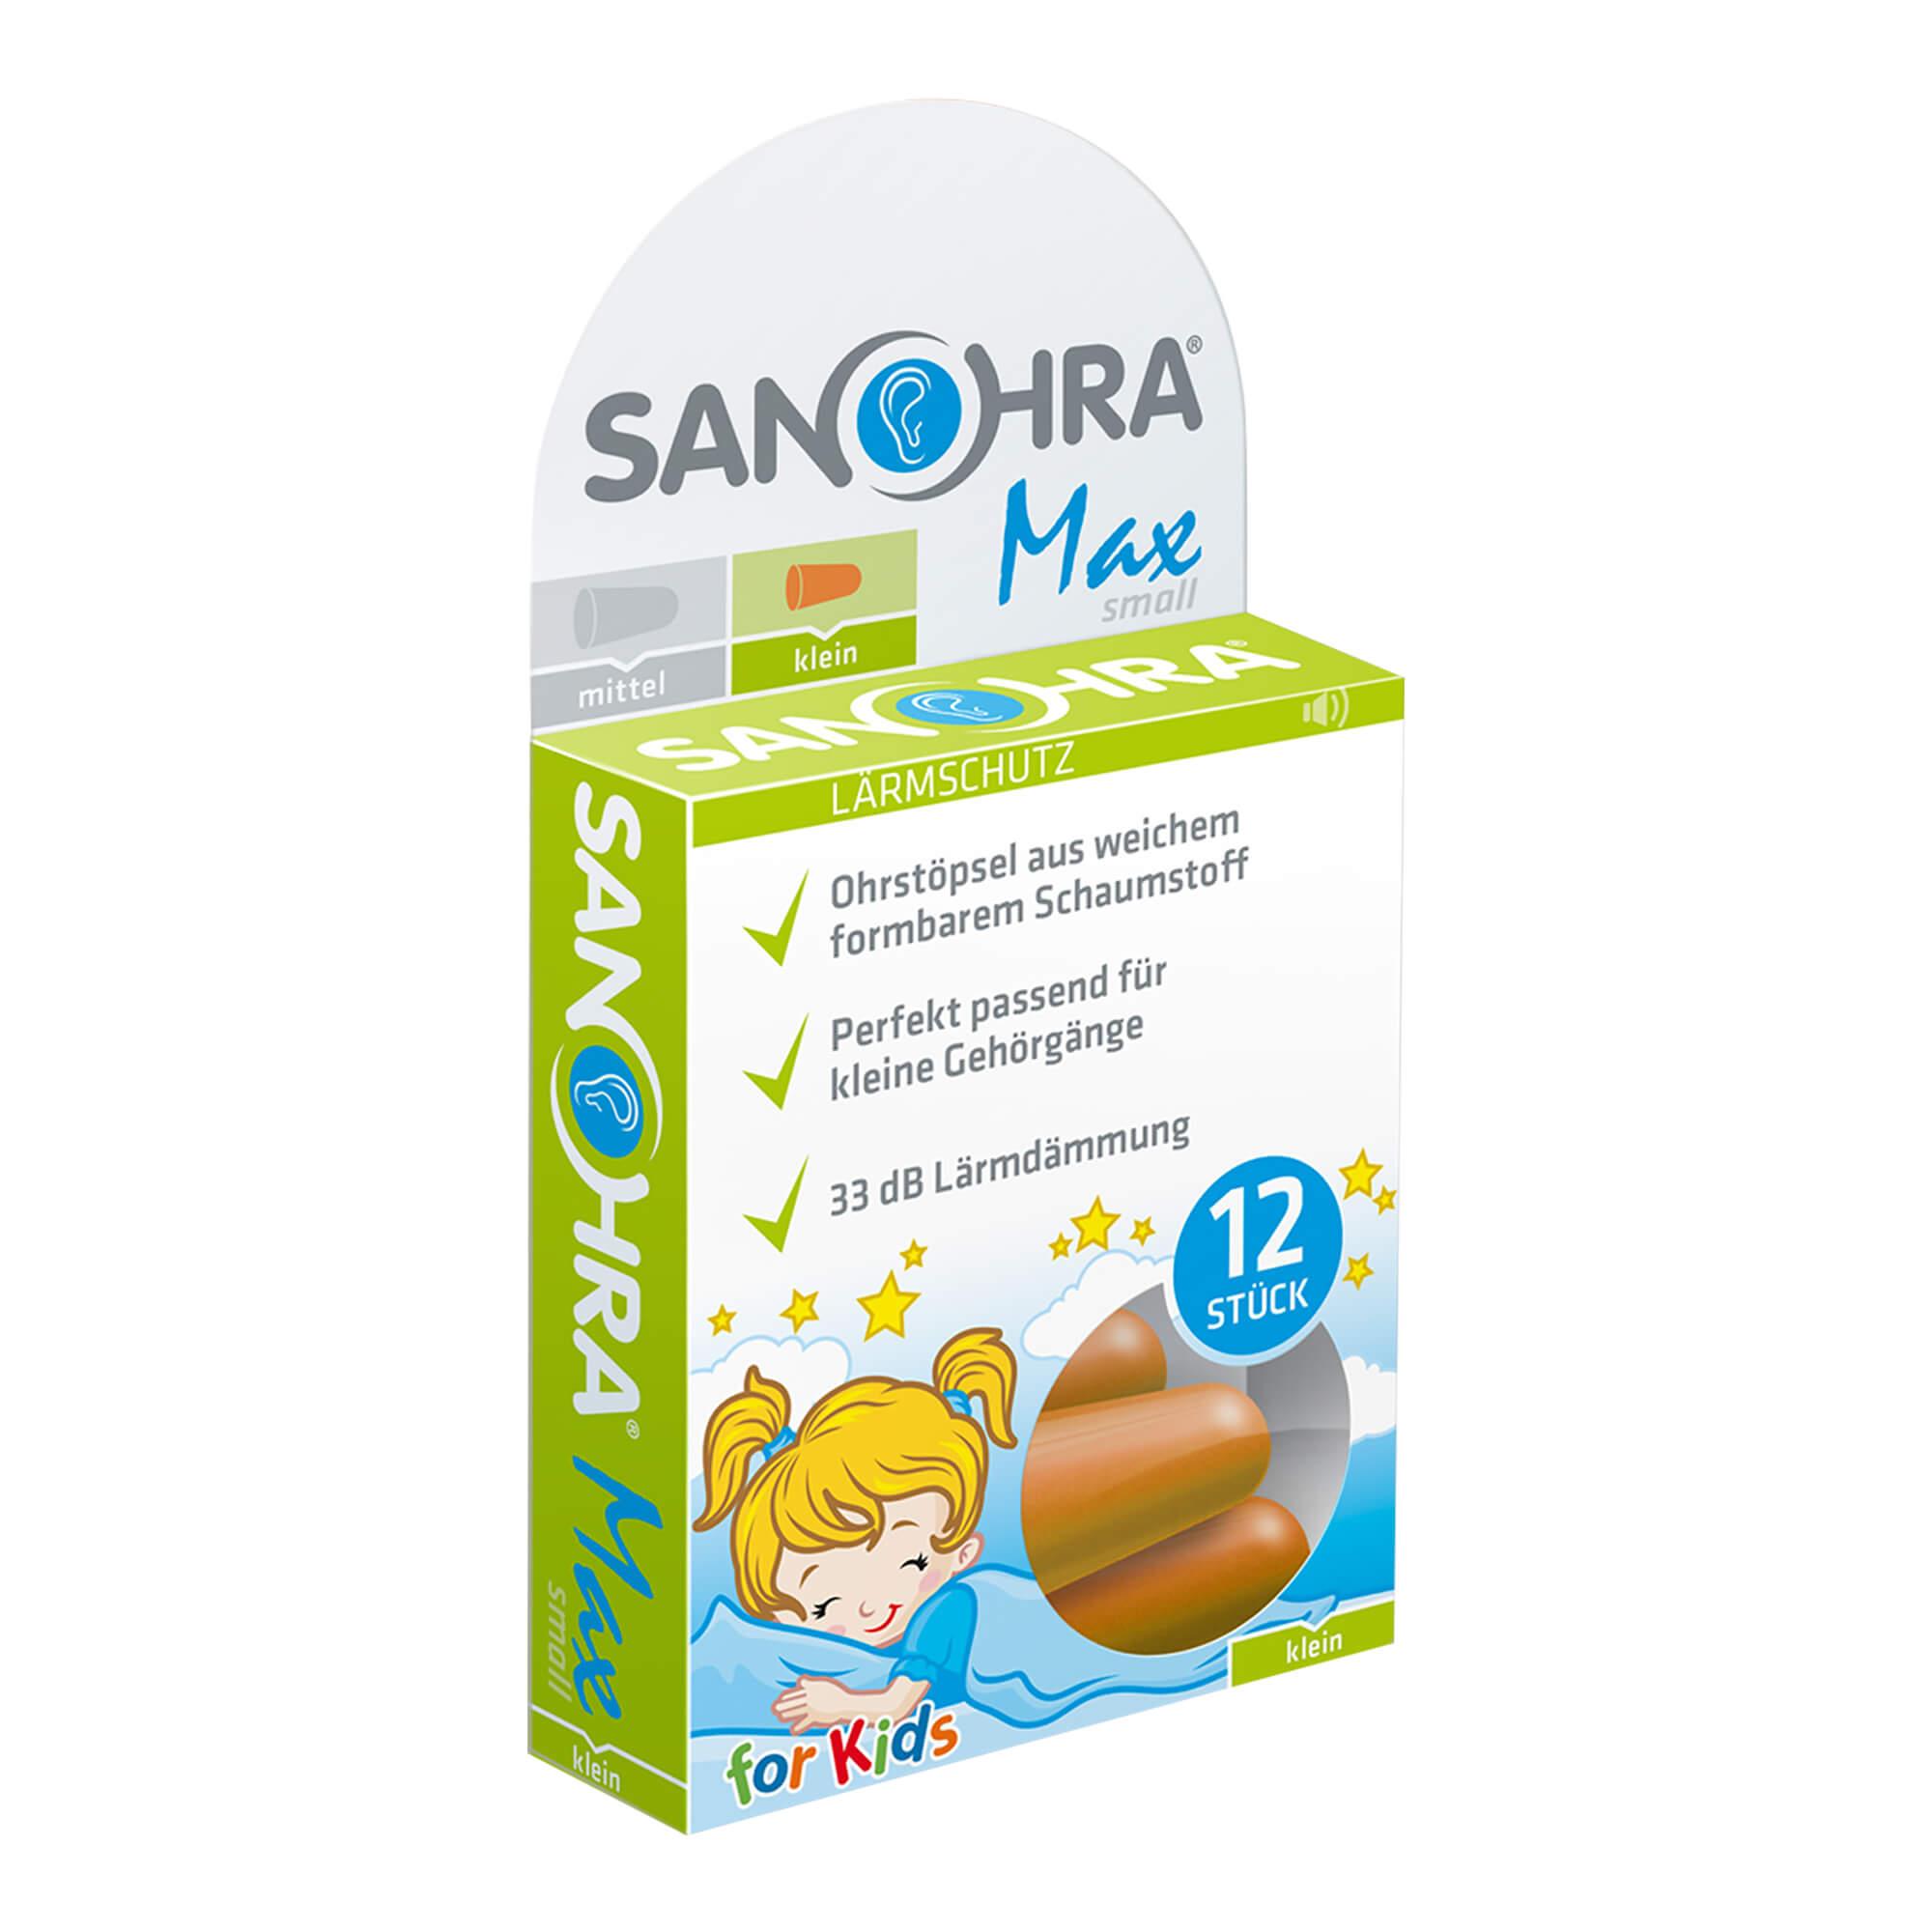 Sanohra Max Gehörschutzstöpsel für Kinder